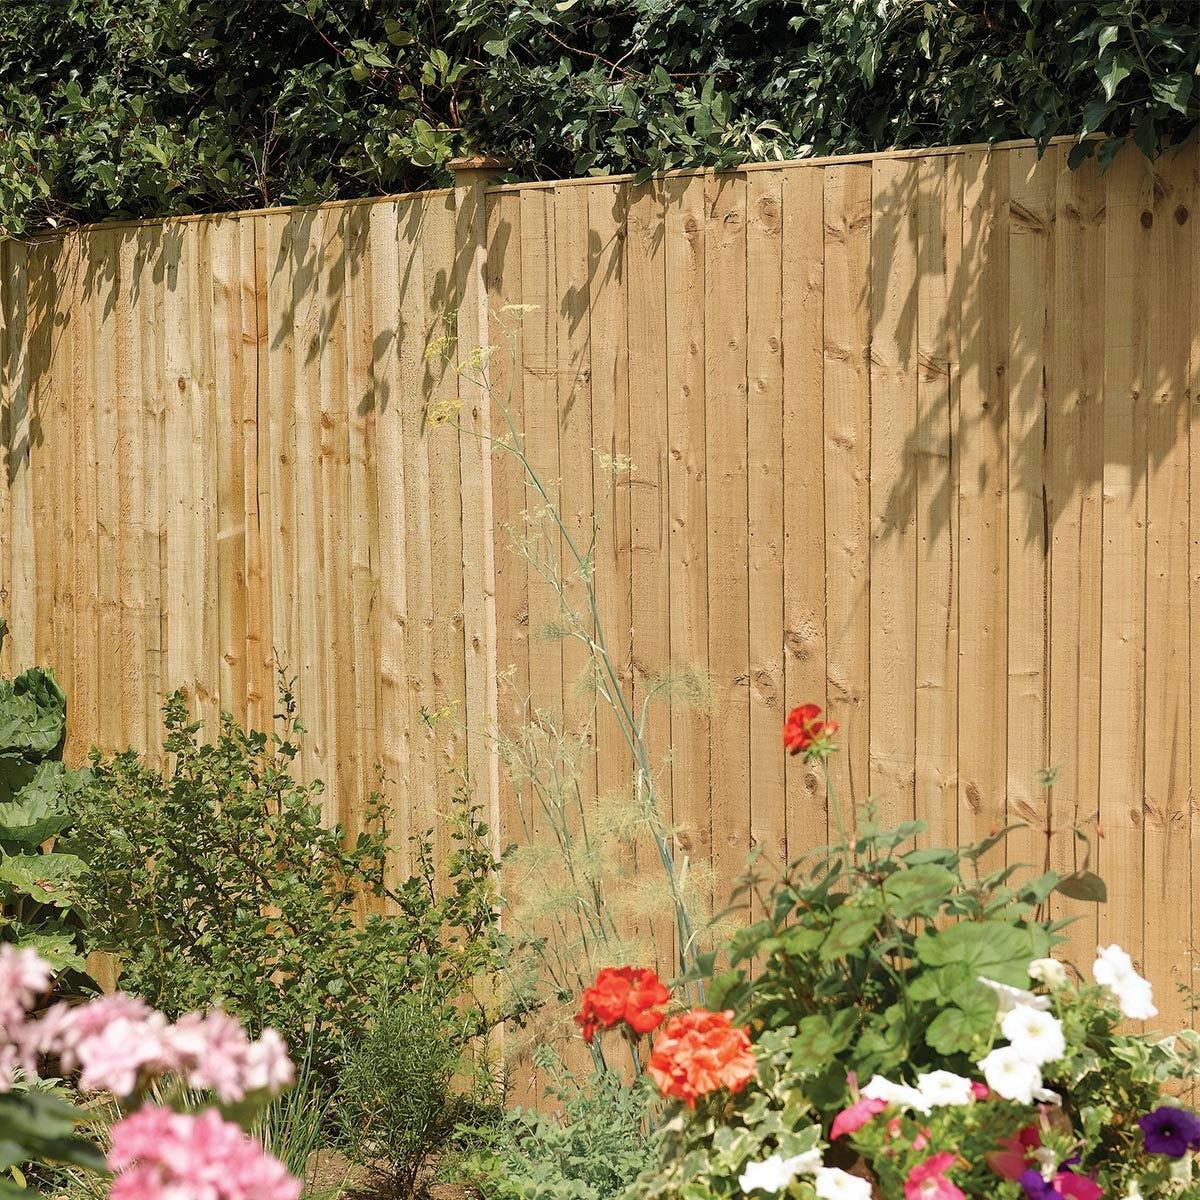 Rowlinson 3pk Vertical Board Panel Pressure Treated Fence - 6x3